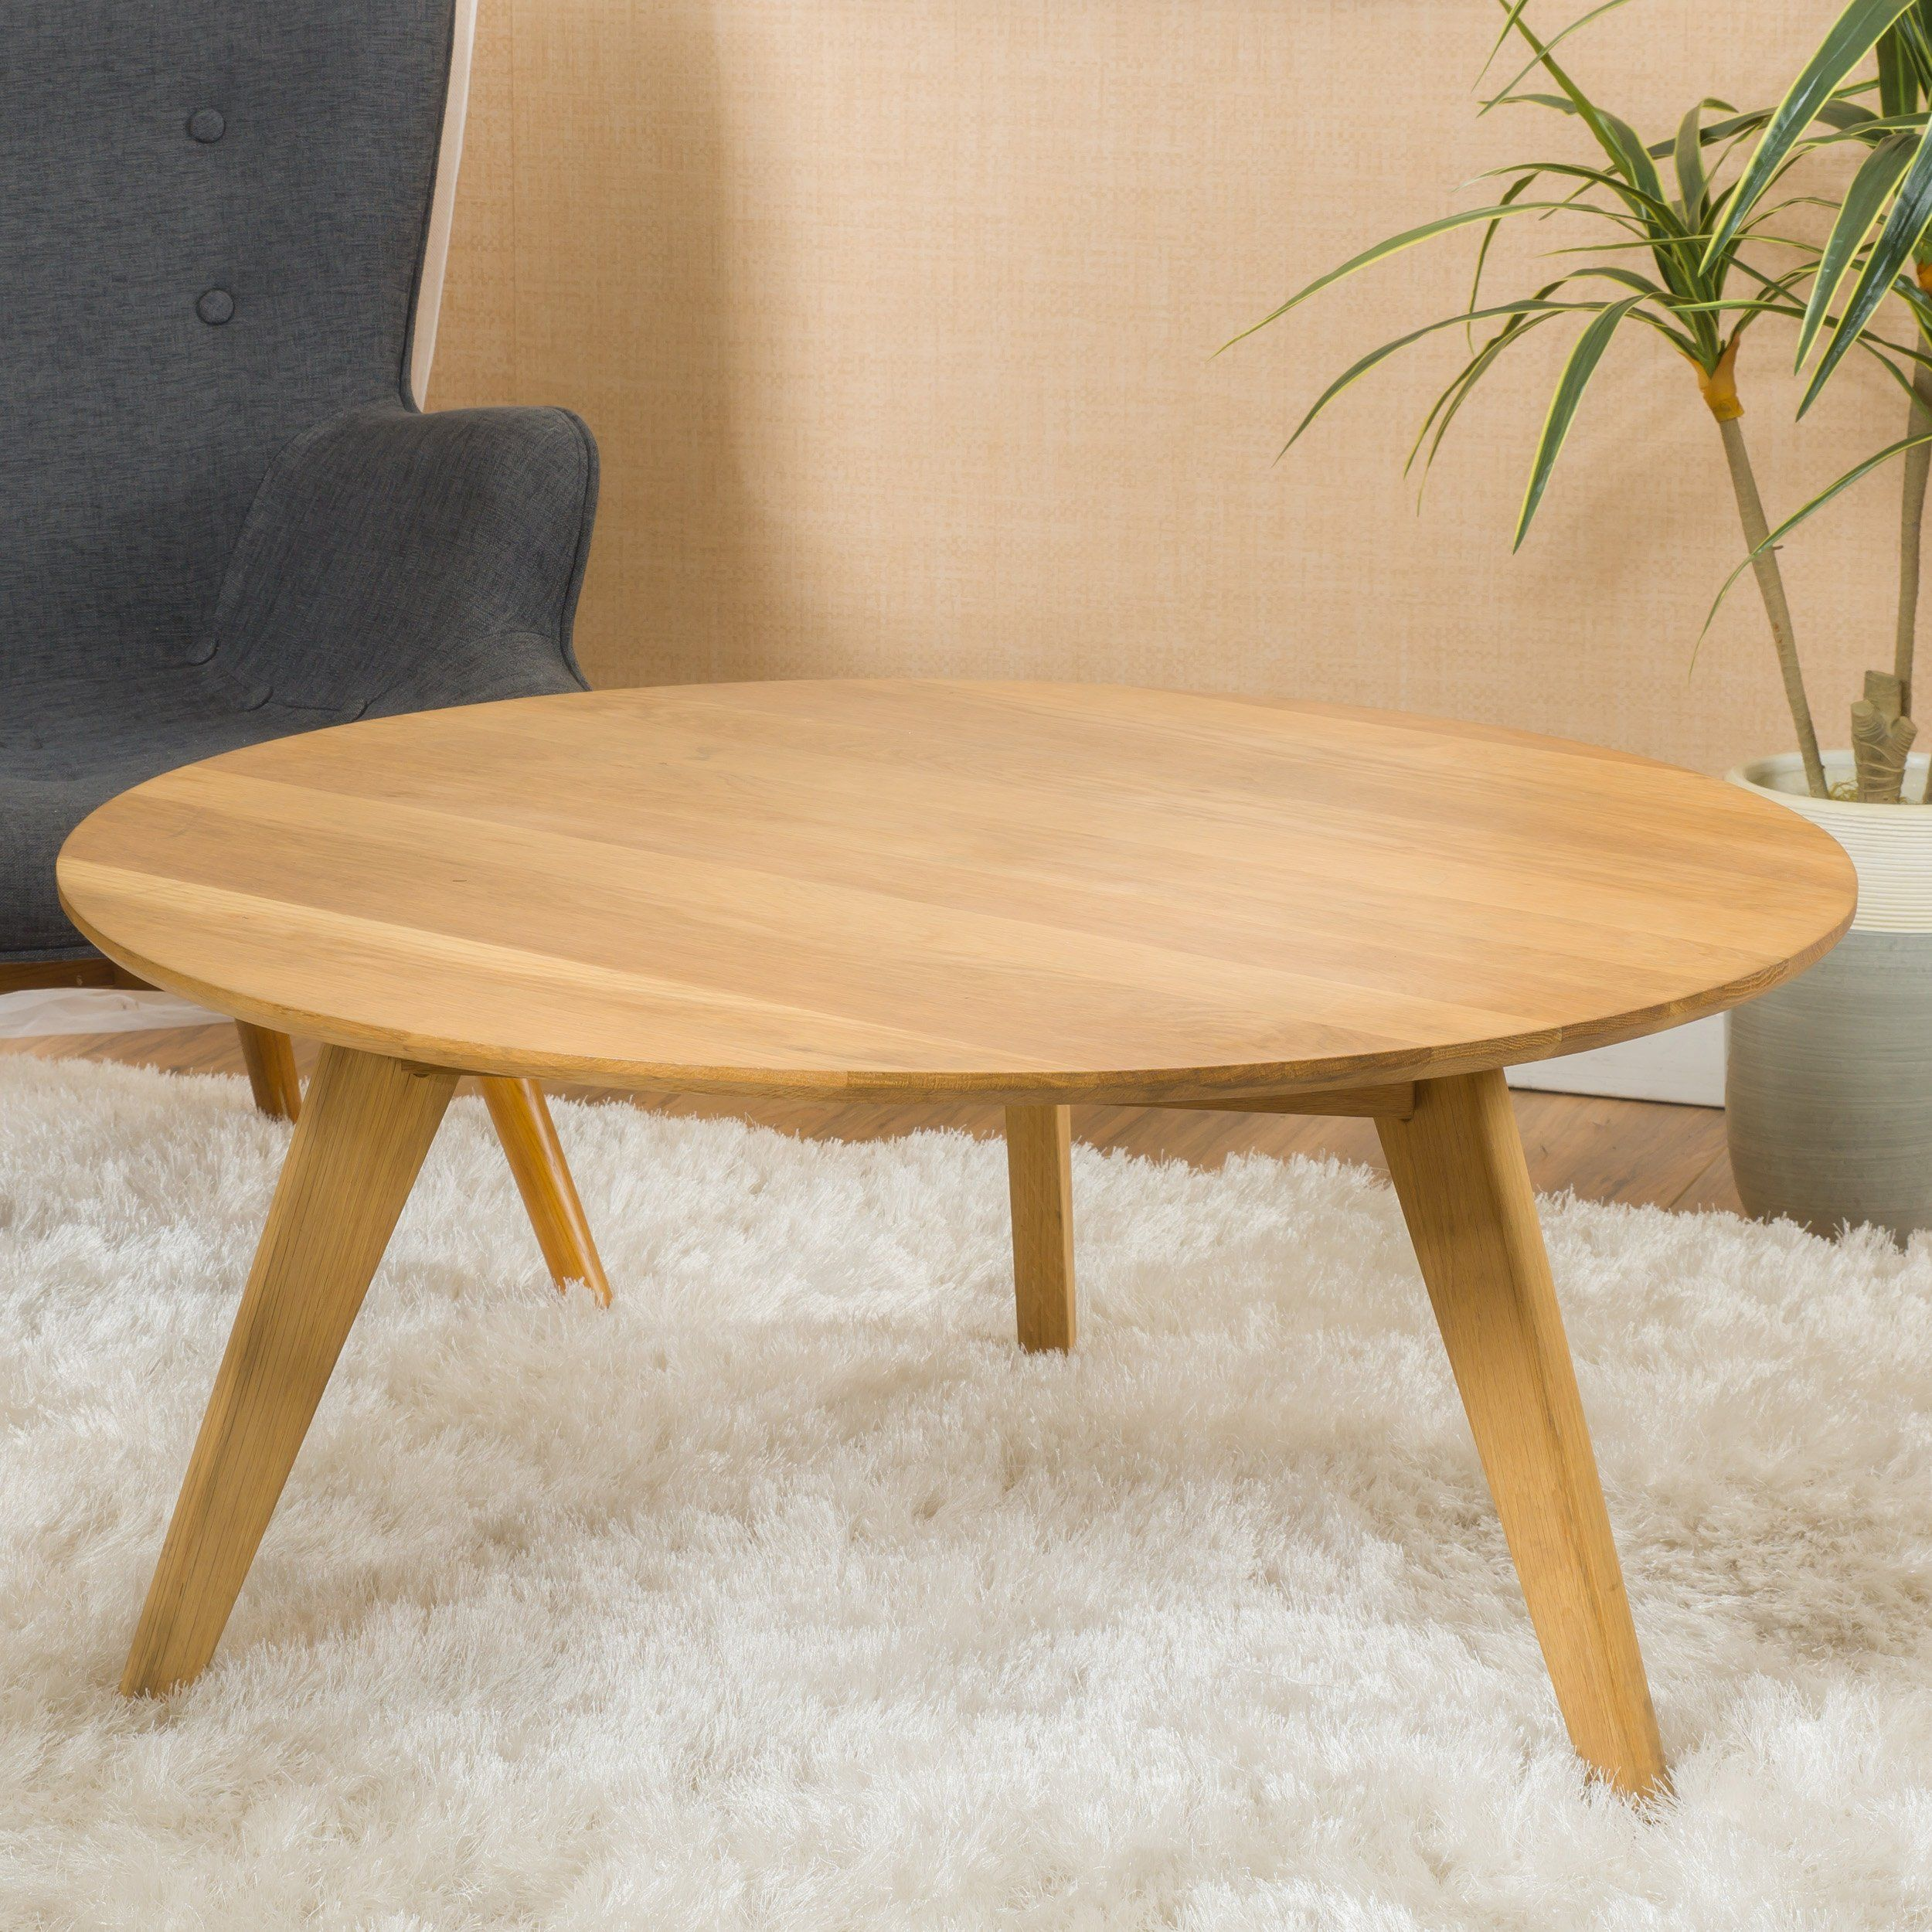 Hampton Reclaimed Barrel Side Table 59911492 From Classic Home Side Table Kosas Home Side Table Wood [ 1300 x 958 Pixel ]